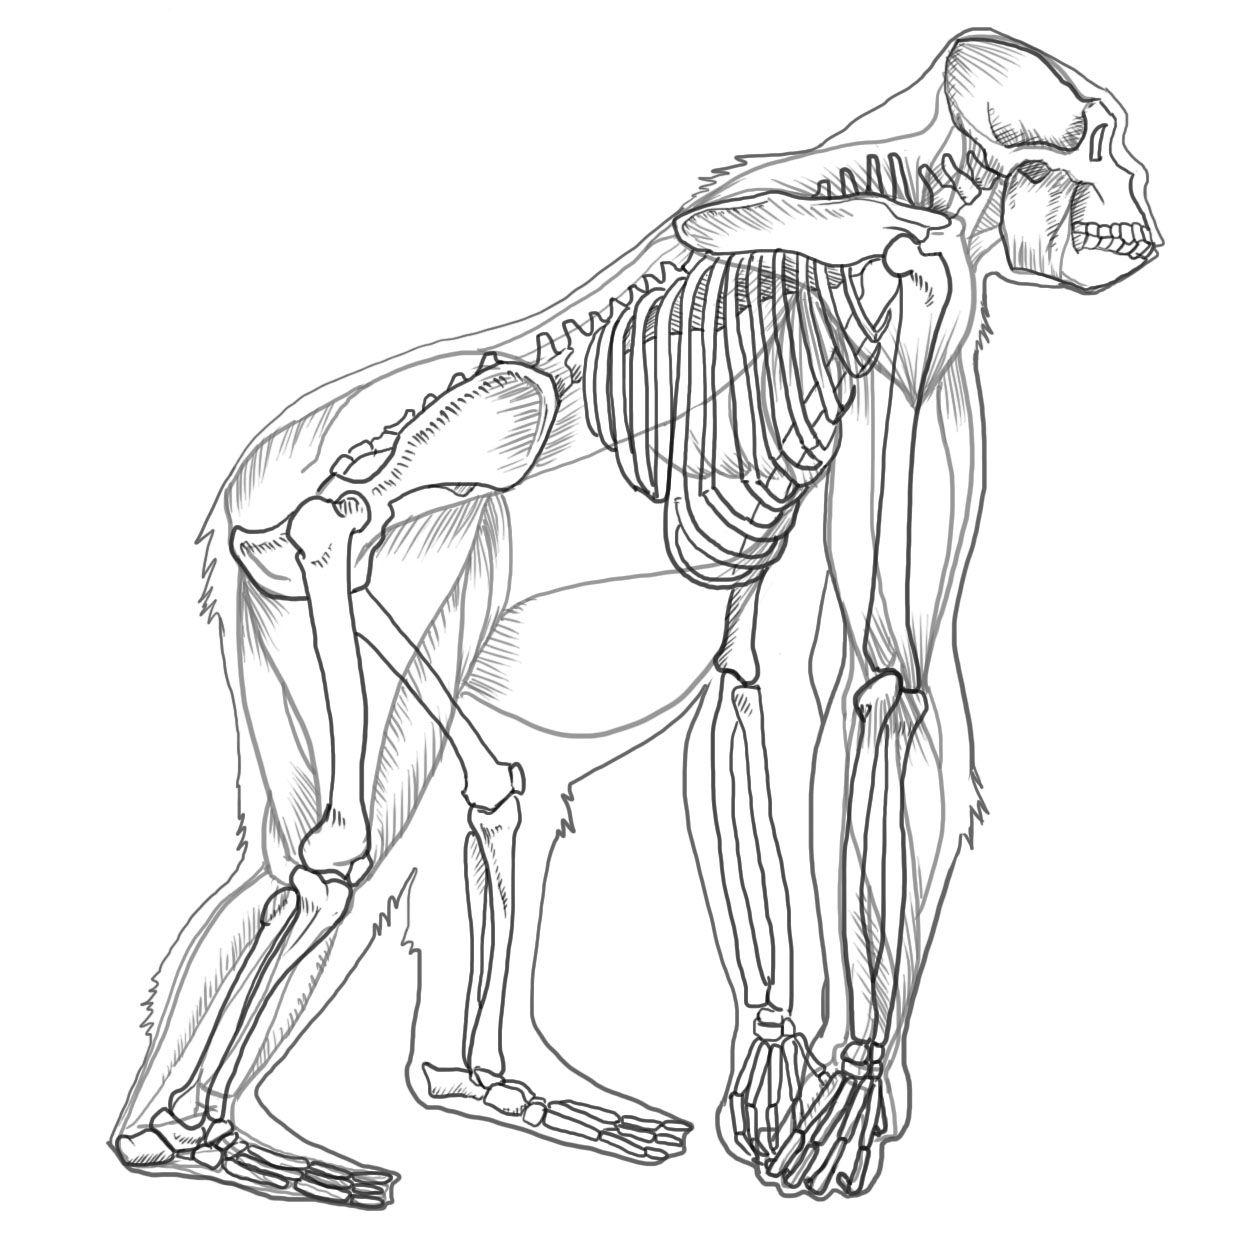 gorilla.jpg] | animal anatomy | Pinterest